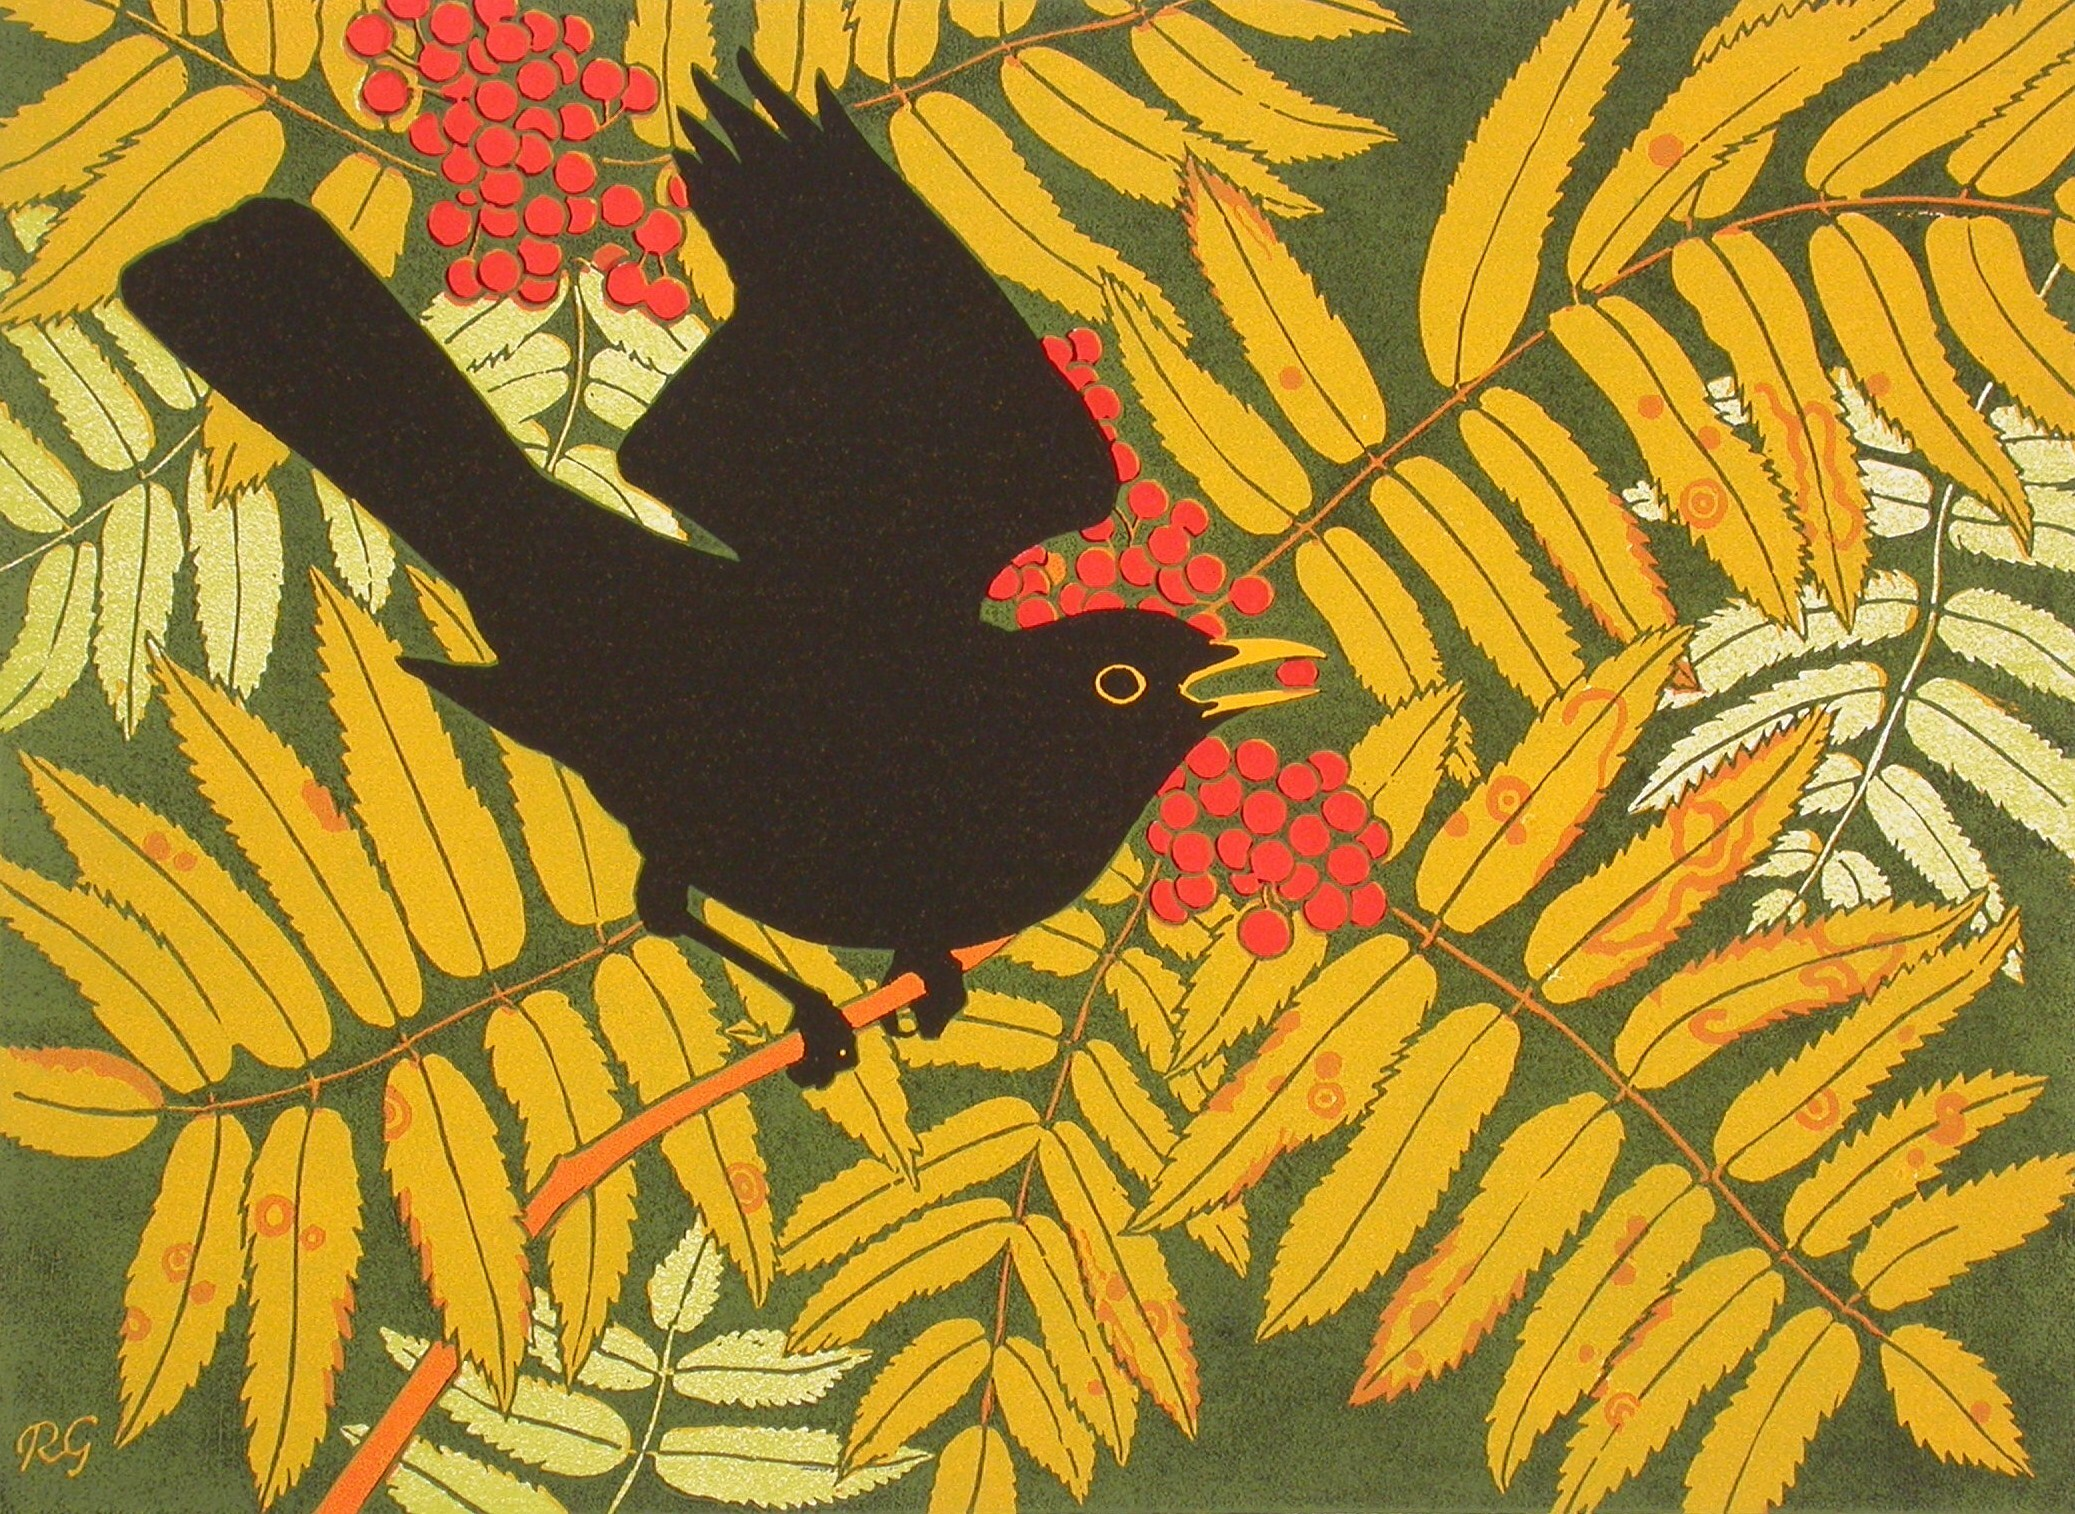 <p>Blackbird in rowan by Robert Gillmor</p>